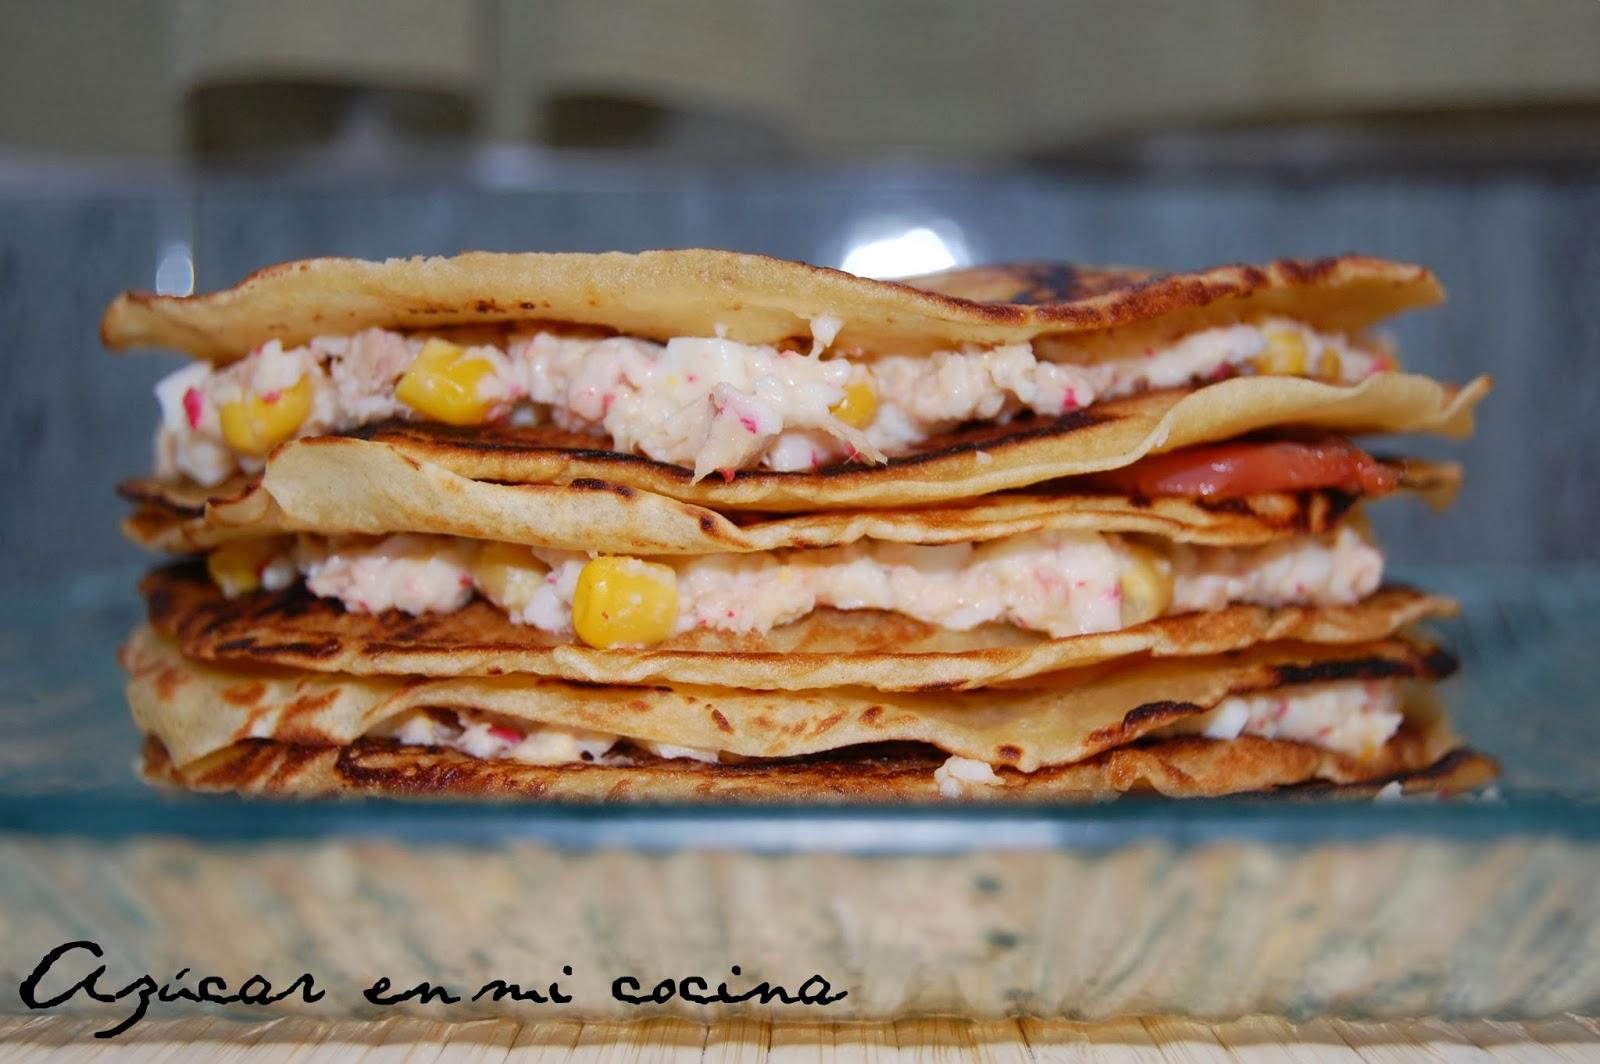 http://azucarenmicocina.blogspot.com.es/2014/02/mille-crepe-salada-de-surimi-y-trucha.html